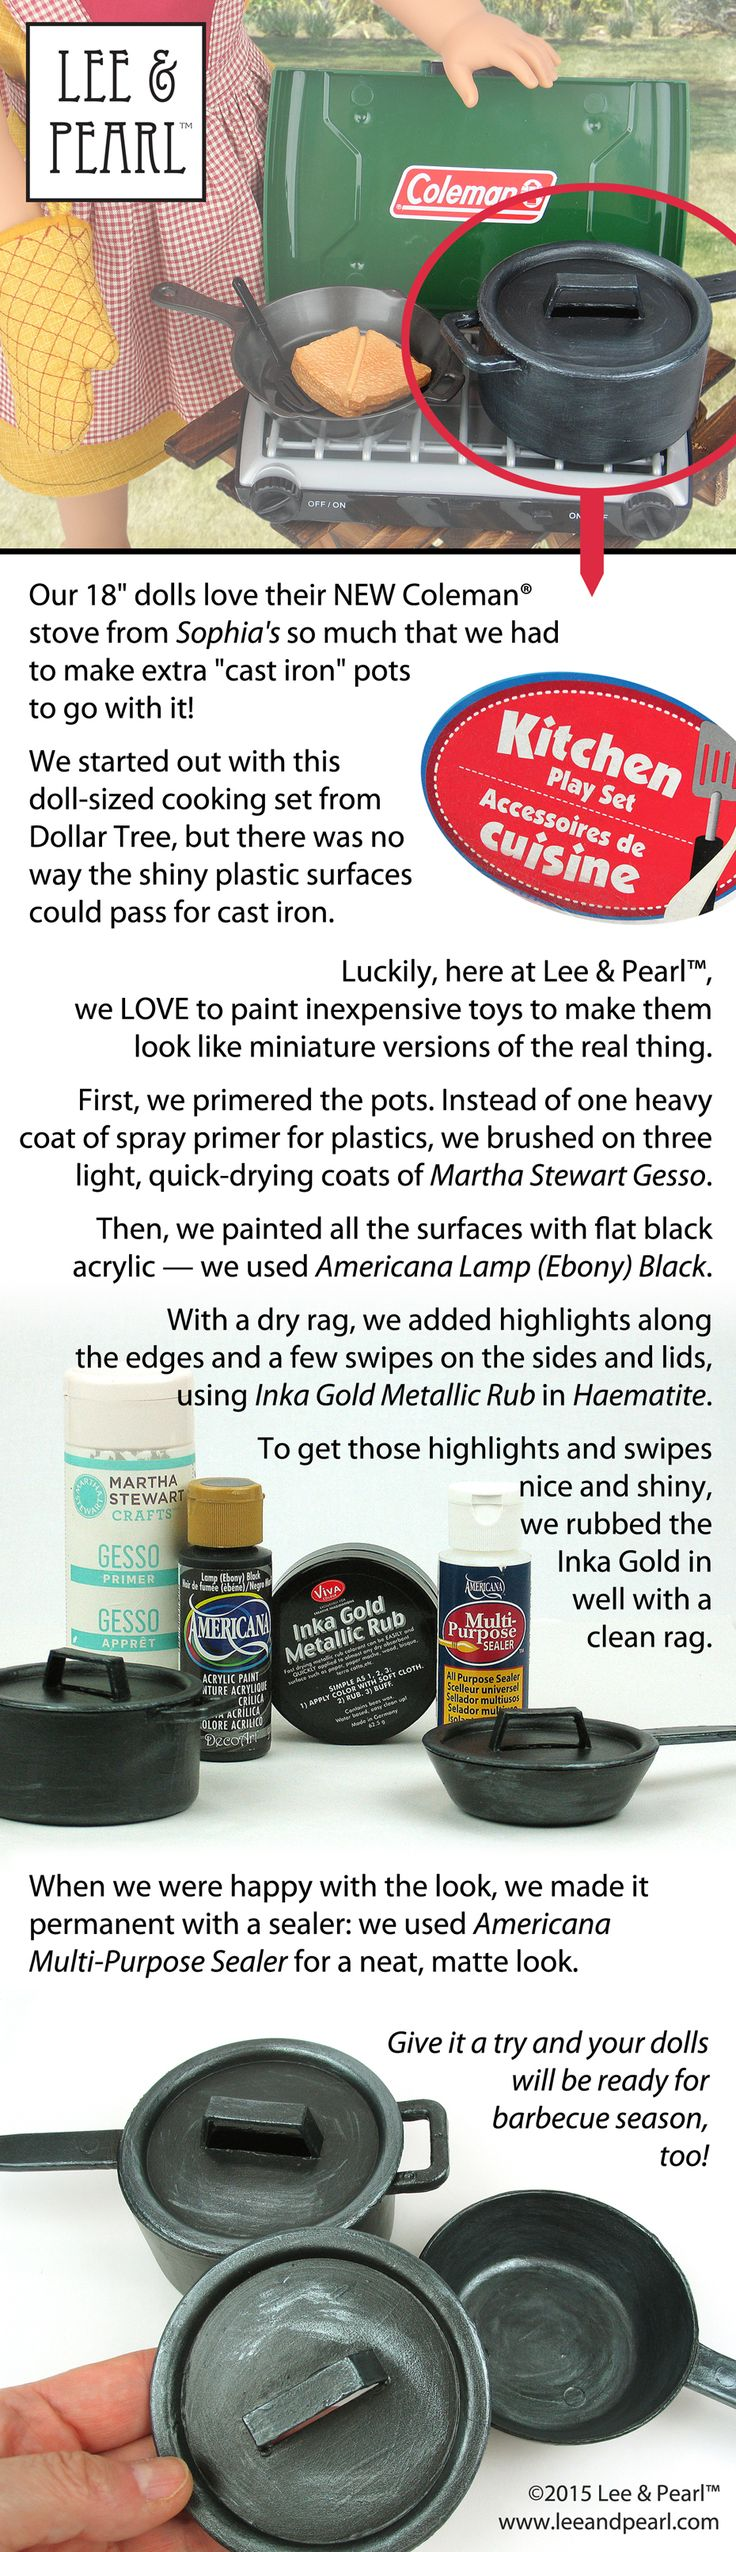 Enchanting American Plastics Toy Kitchen Sketch - Kitchen Cabinets ...